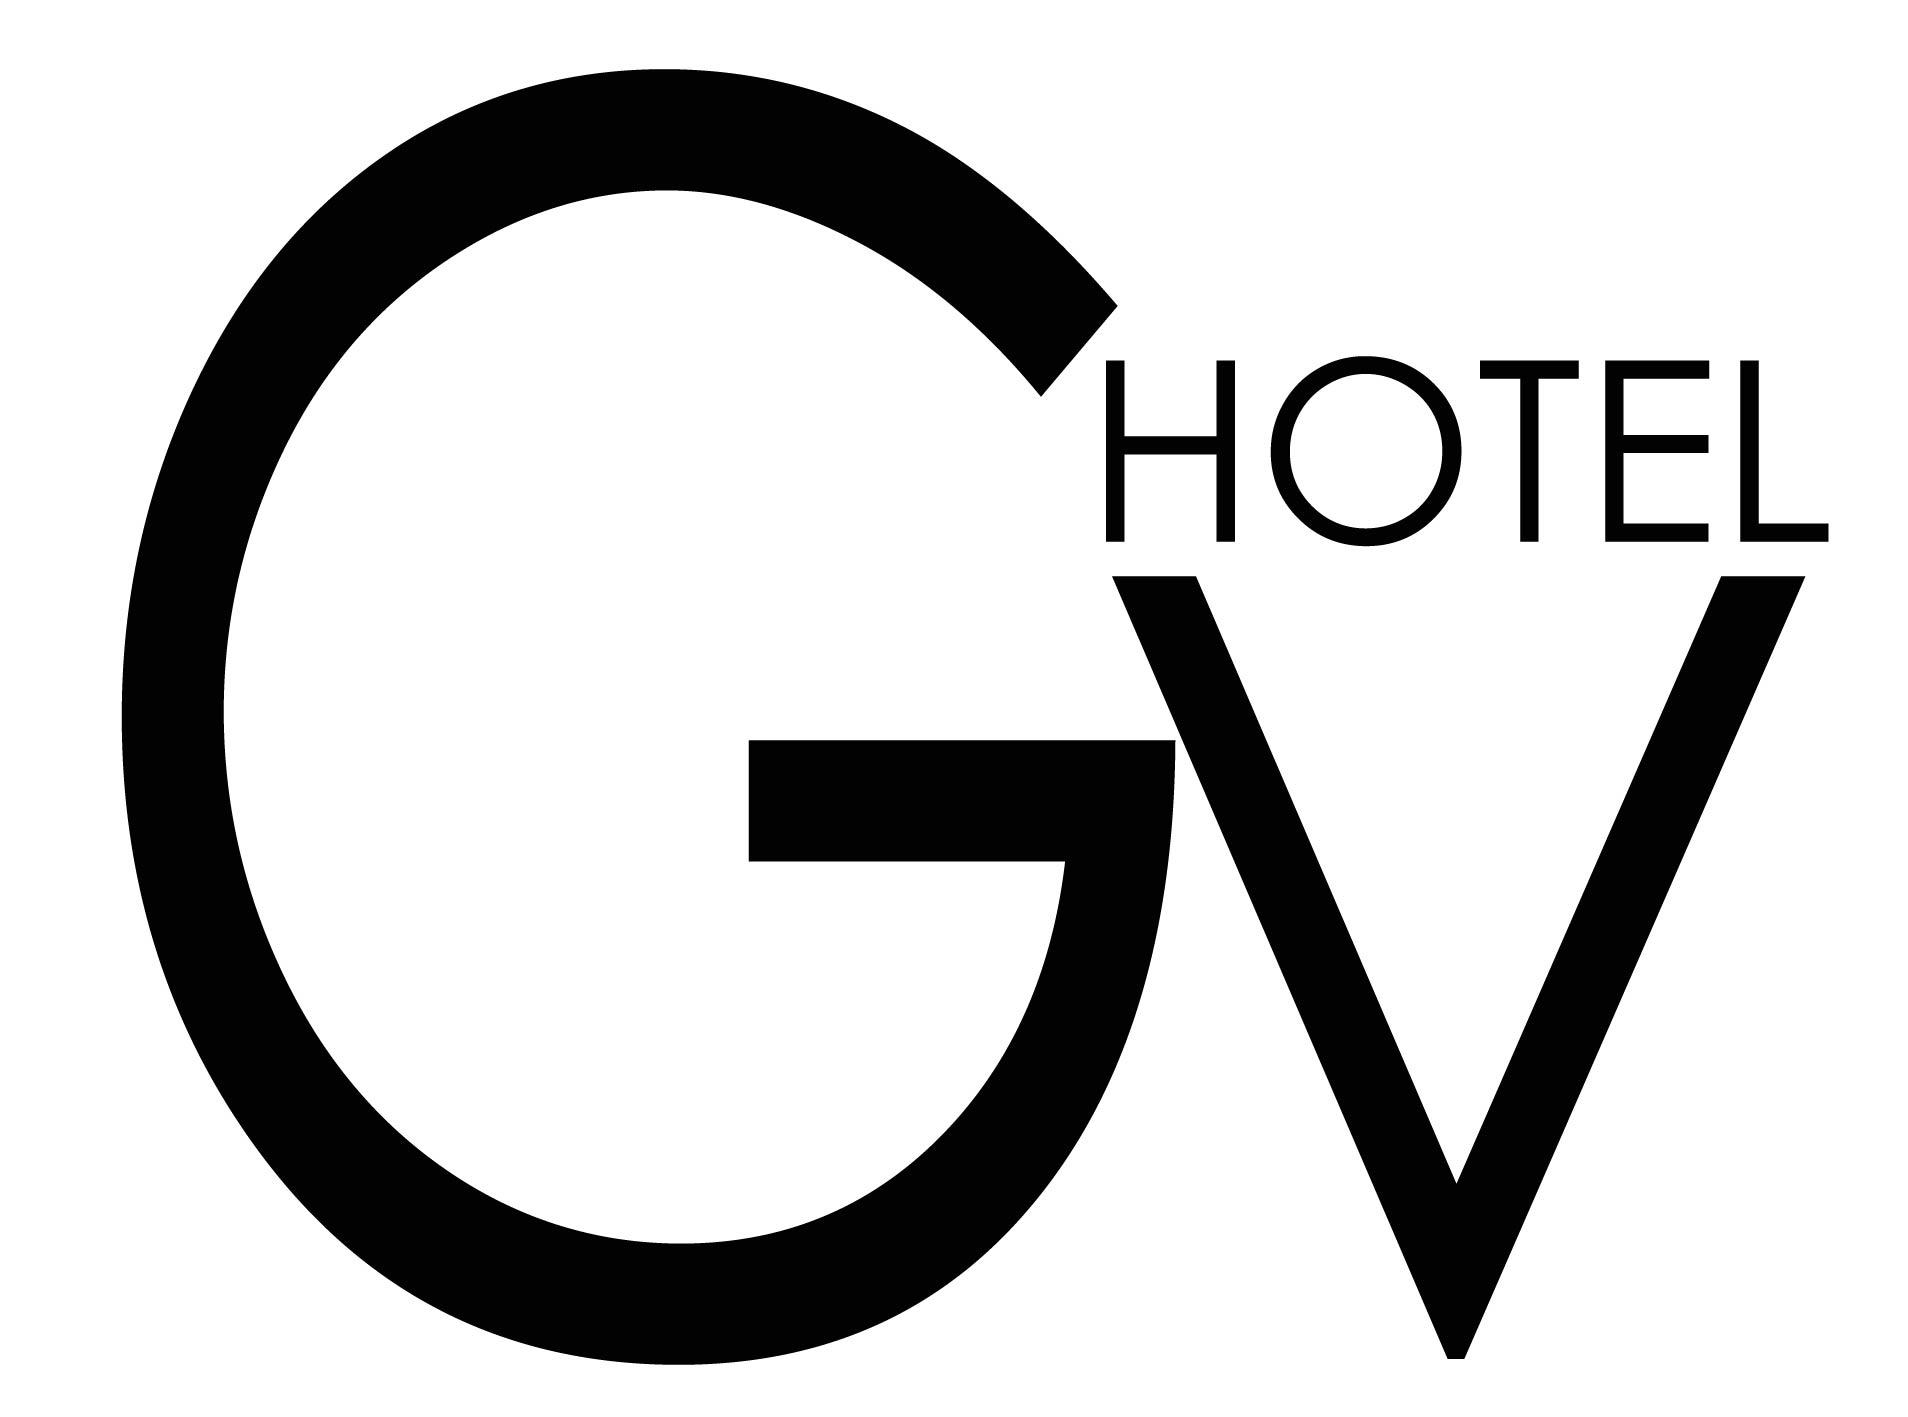 GV Hotel - LOGO BLACK.jpg